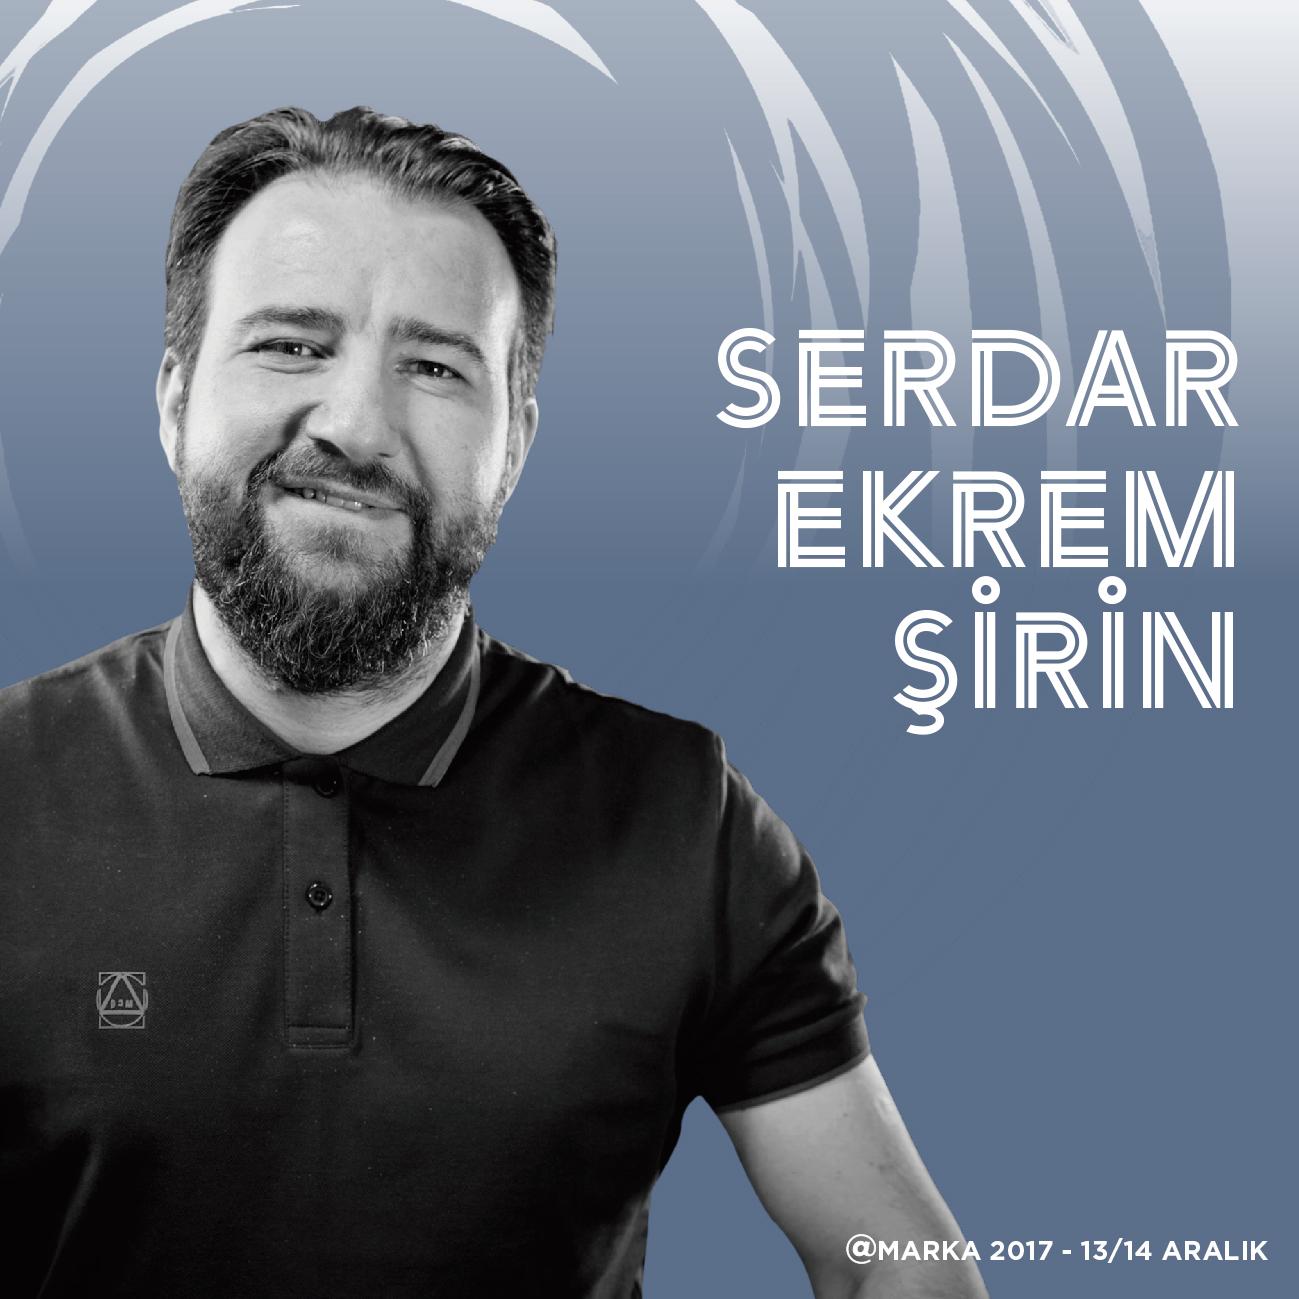 SERDAR EKREM SIRIN